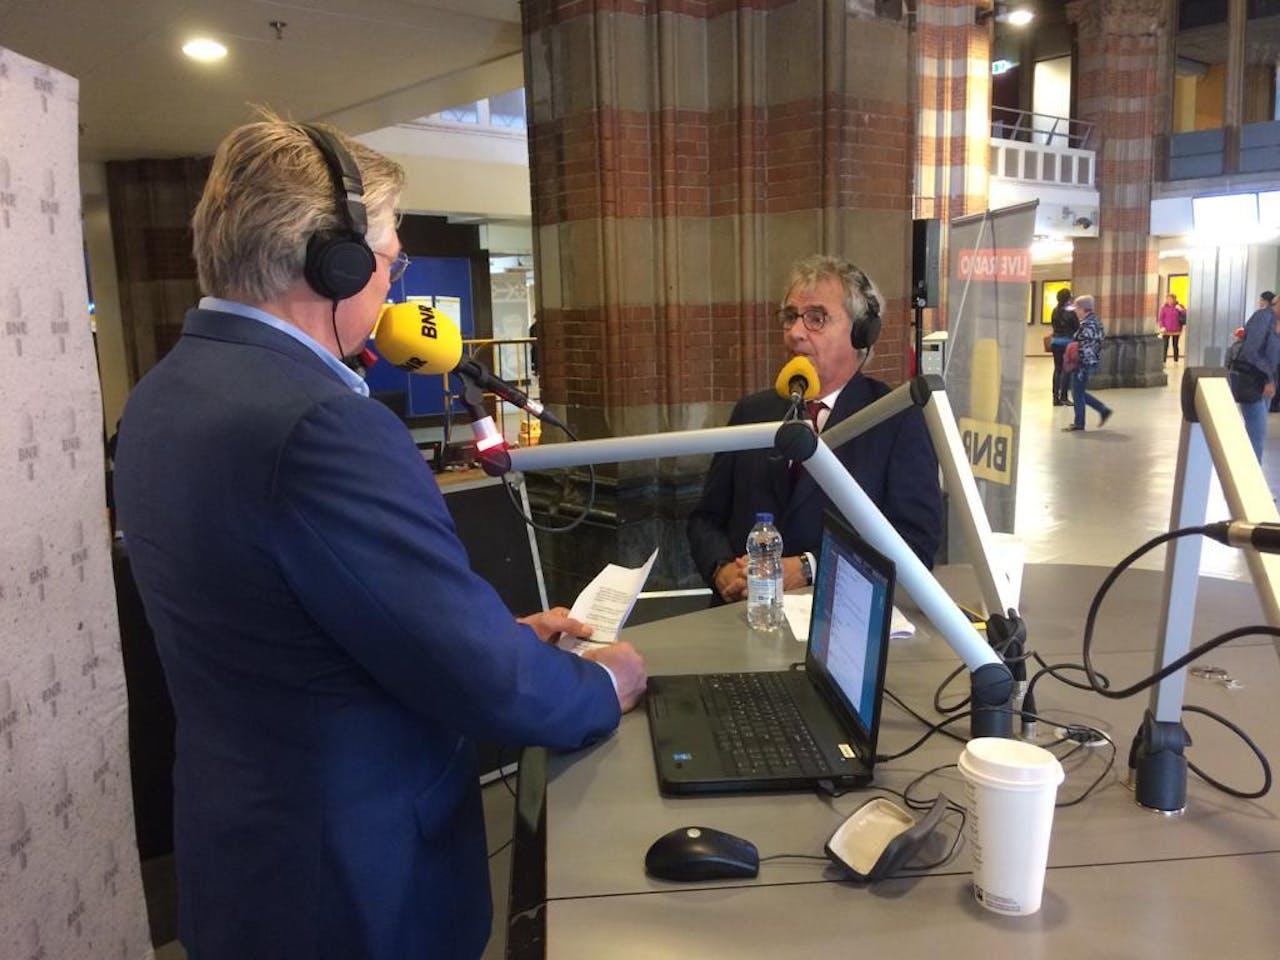 Roelof Hemmen & NS CEO Roger van Boxtel